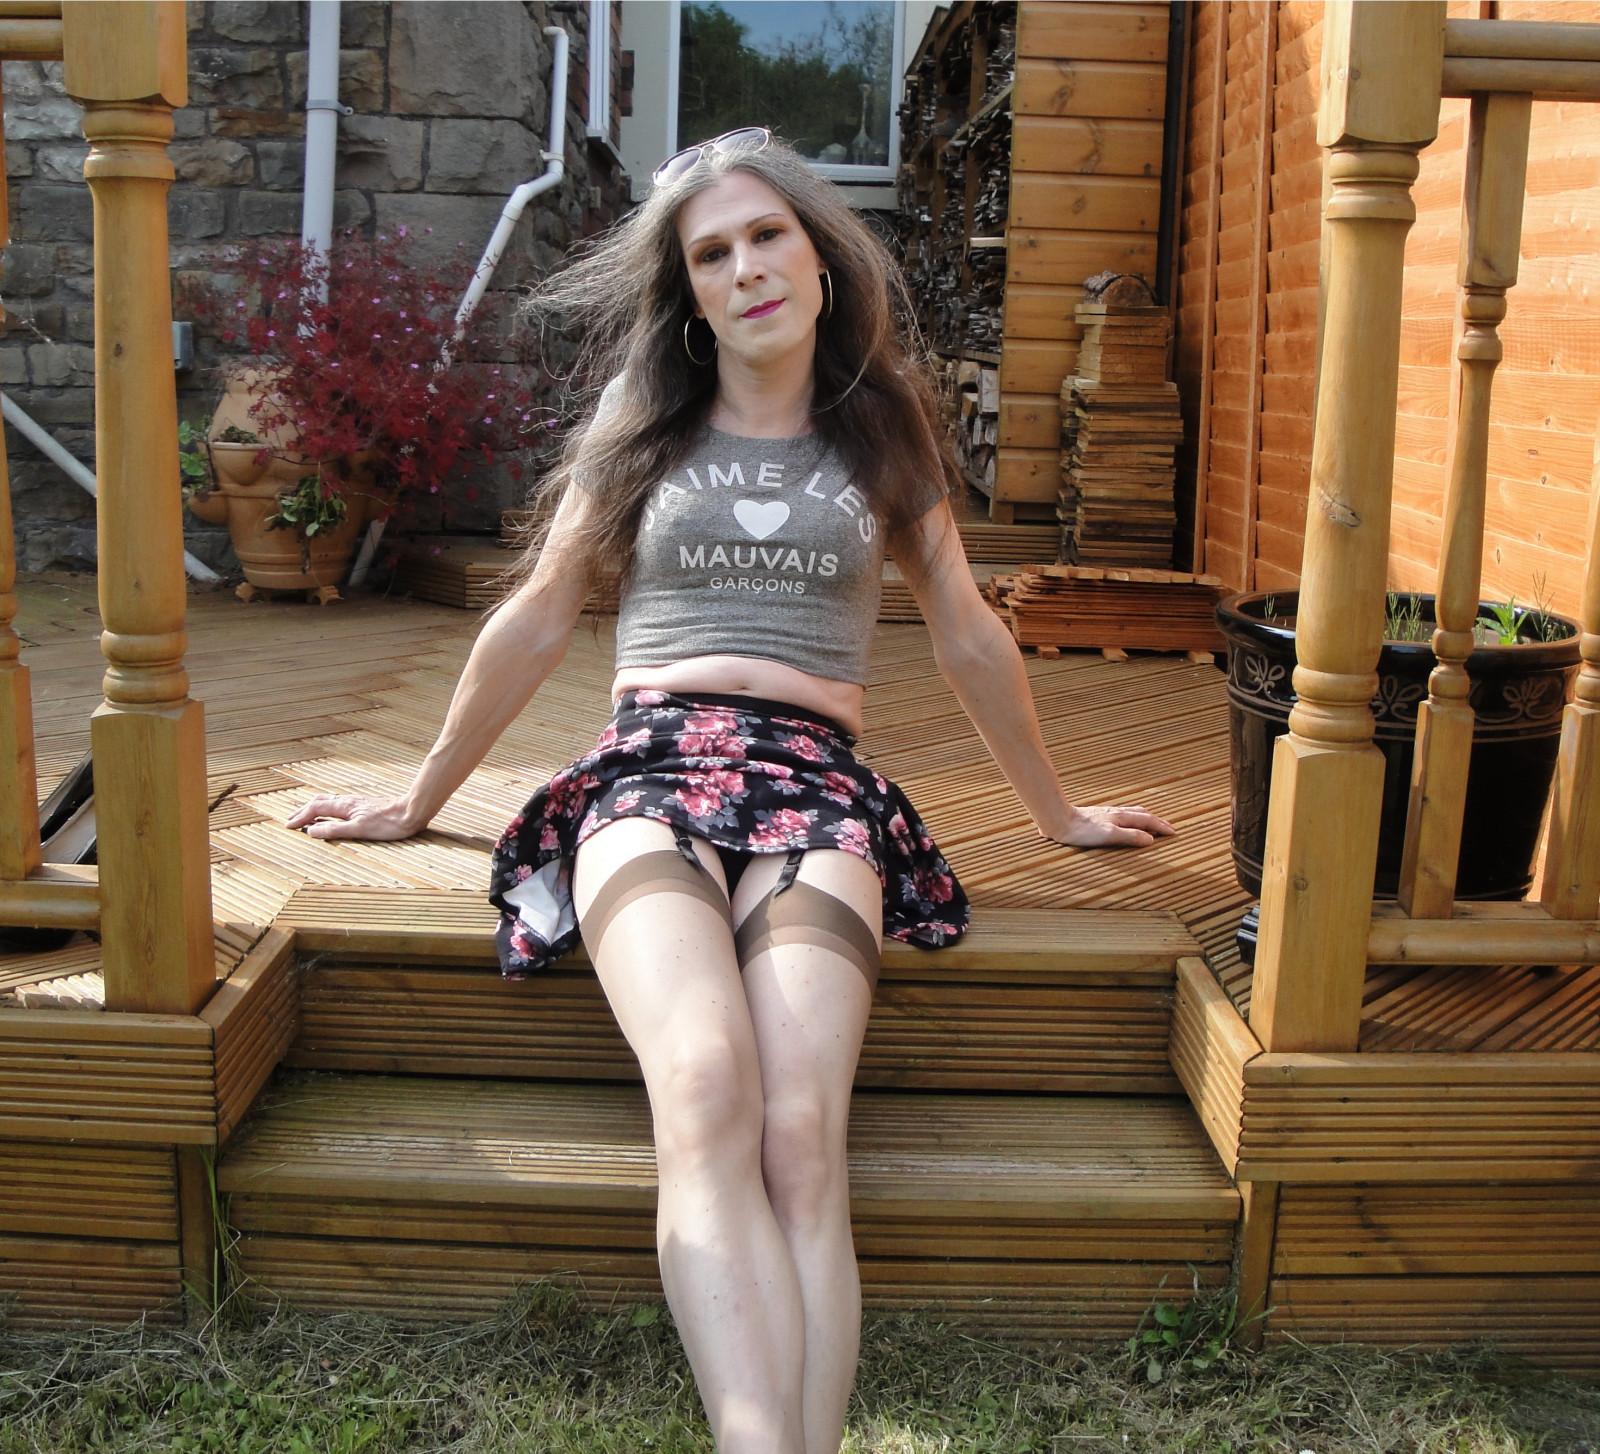 Wallpaper : stockings, outdoors, sitting, Julia, cd, tgirl